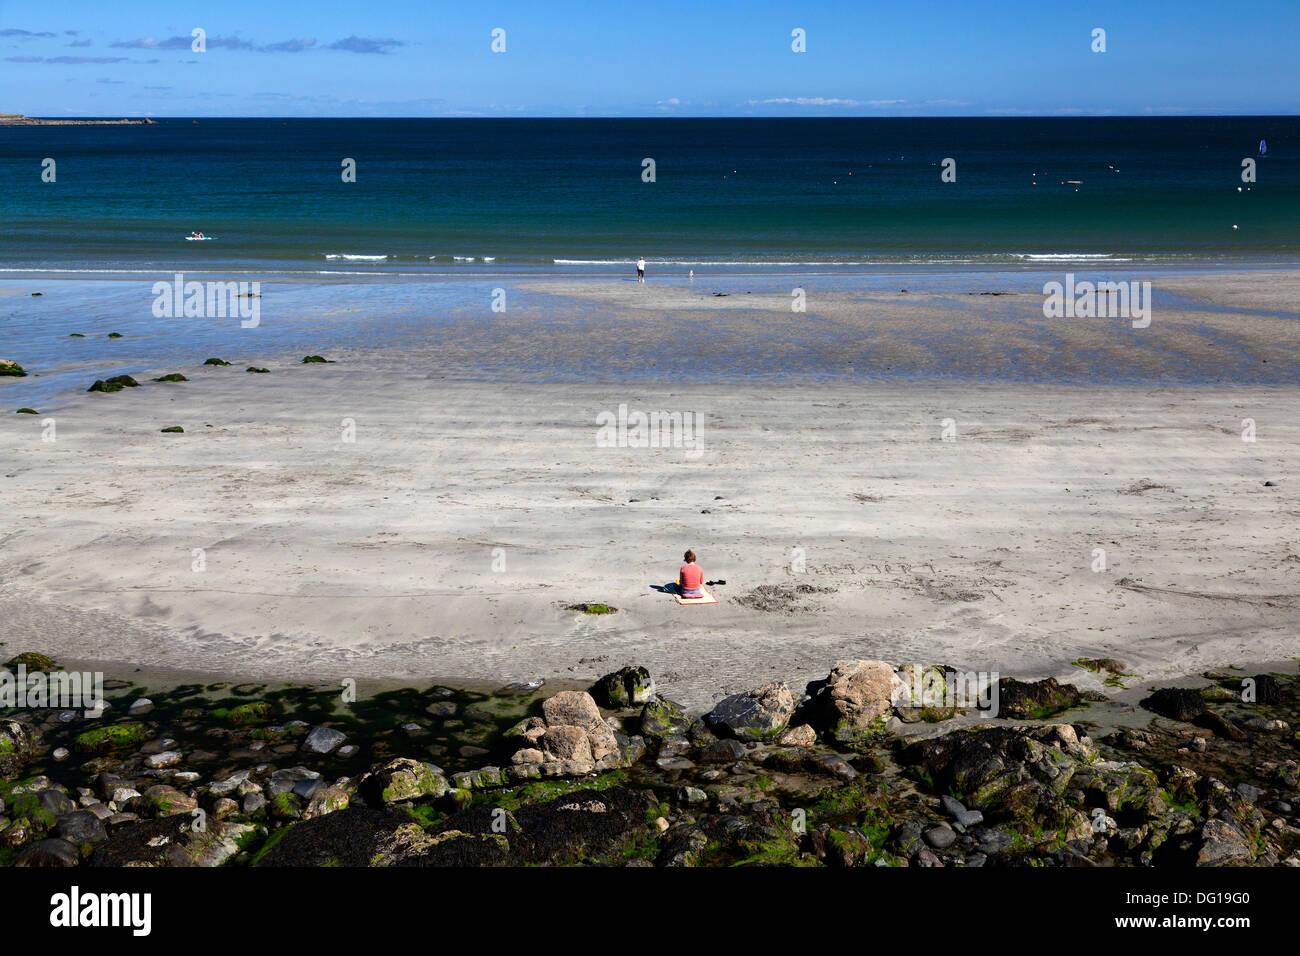 solitary-woman-sitting-on-the-beach-coverack-cornwall-DG19G0.jpg